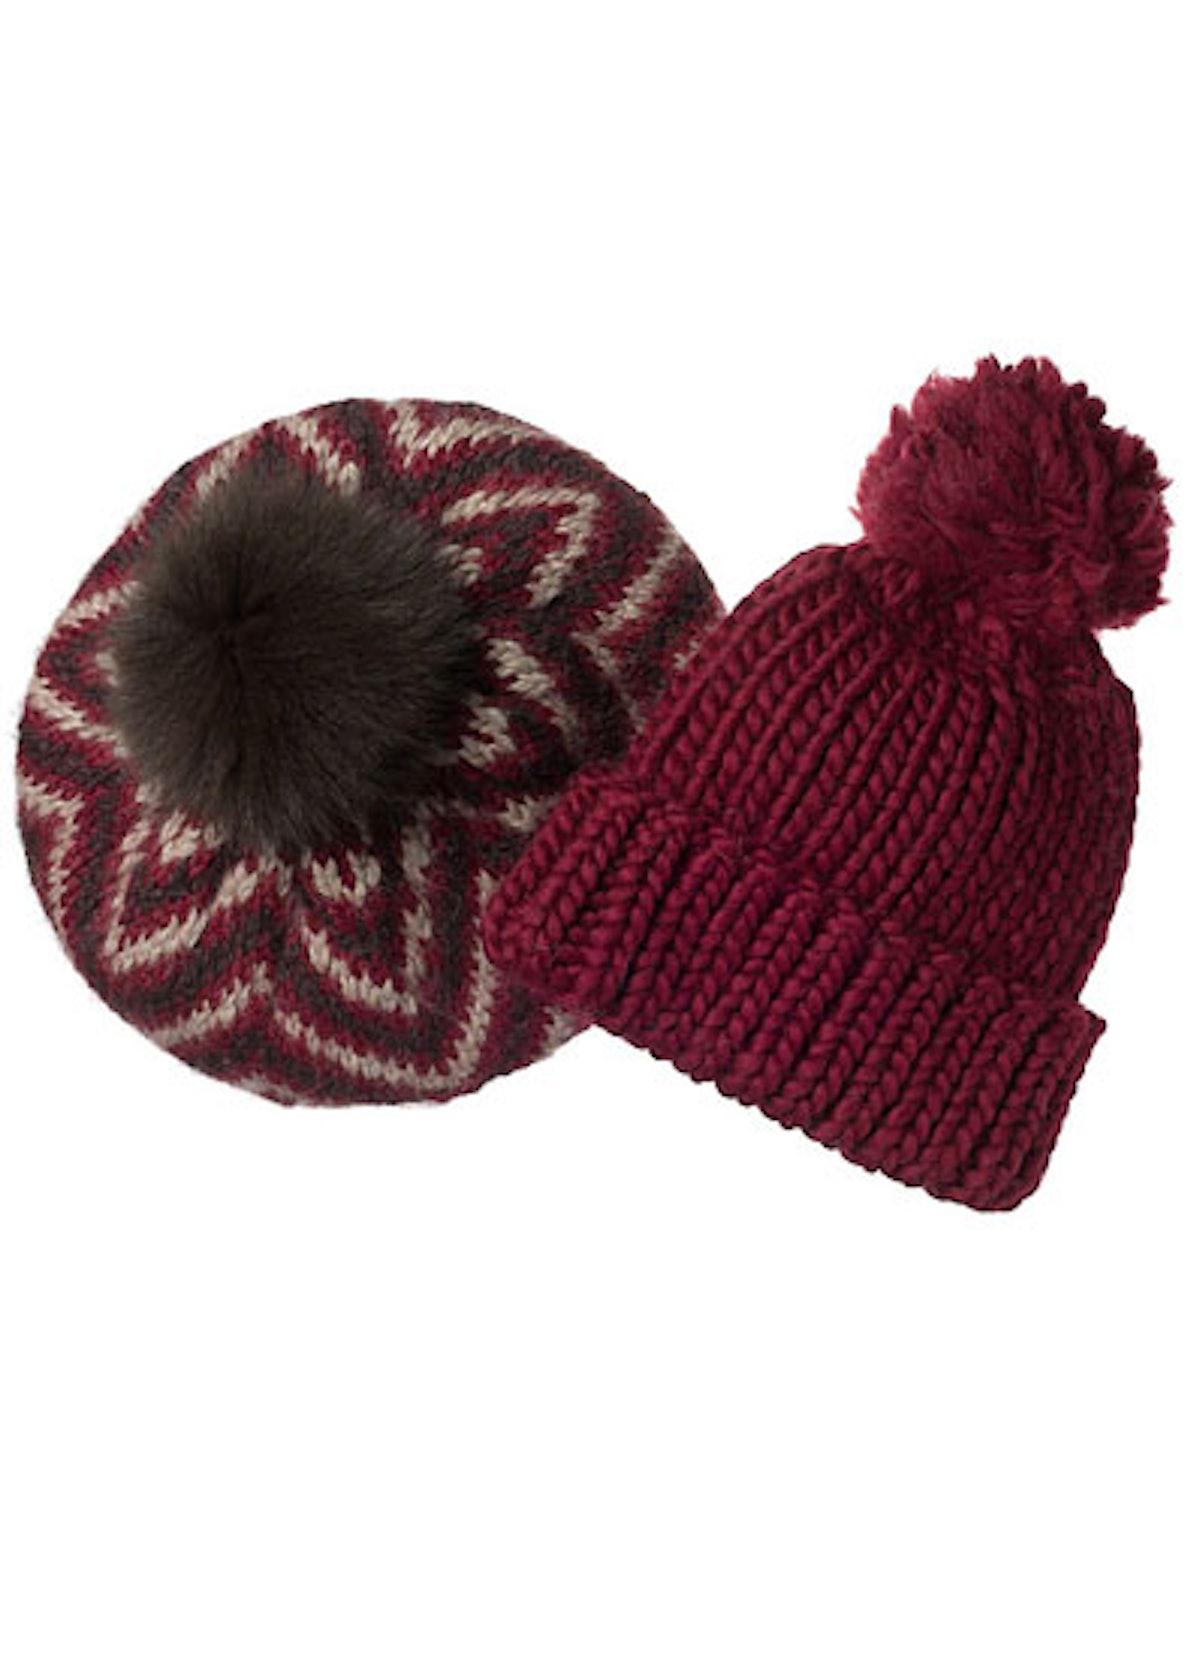 acss-winter-accessories-03-v.jpg